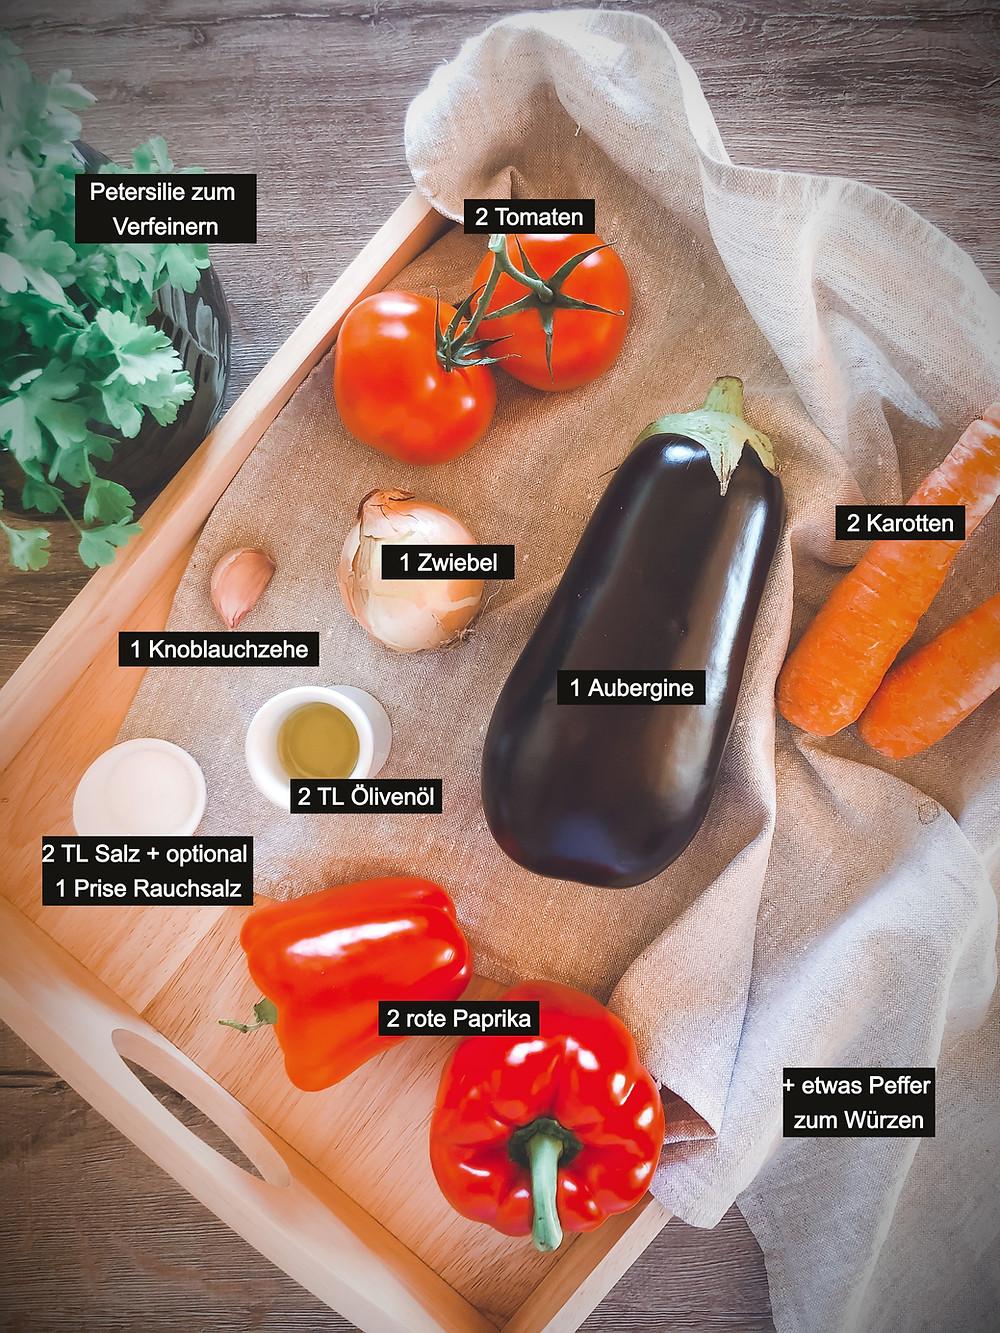 focusflowfood focus flow food gesundes rezept ajvar vegan zum selber machen fitnessfood mealprep Zutaten